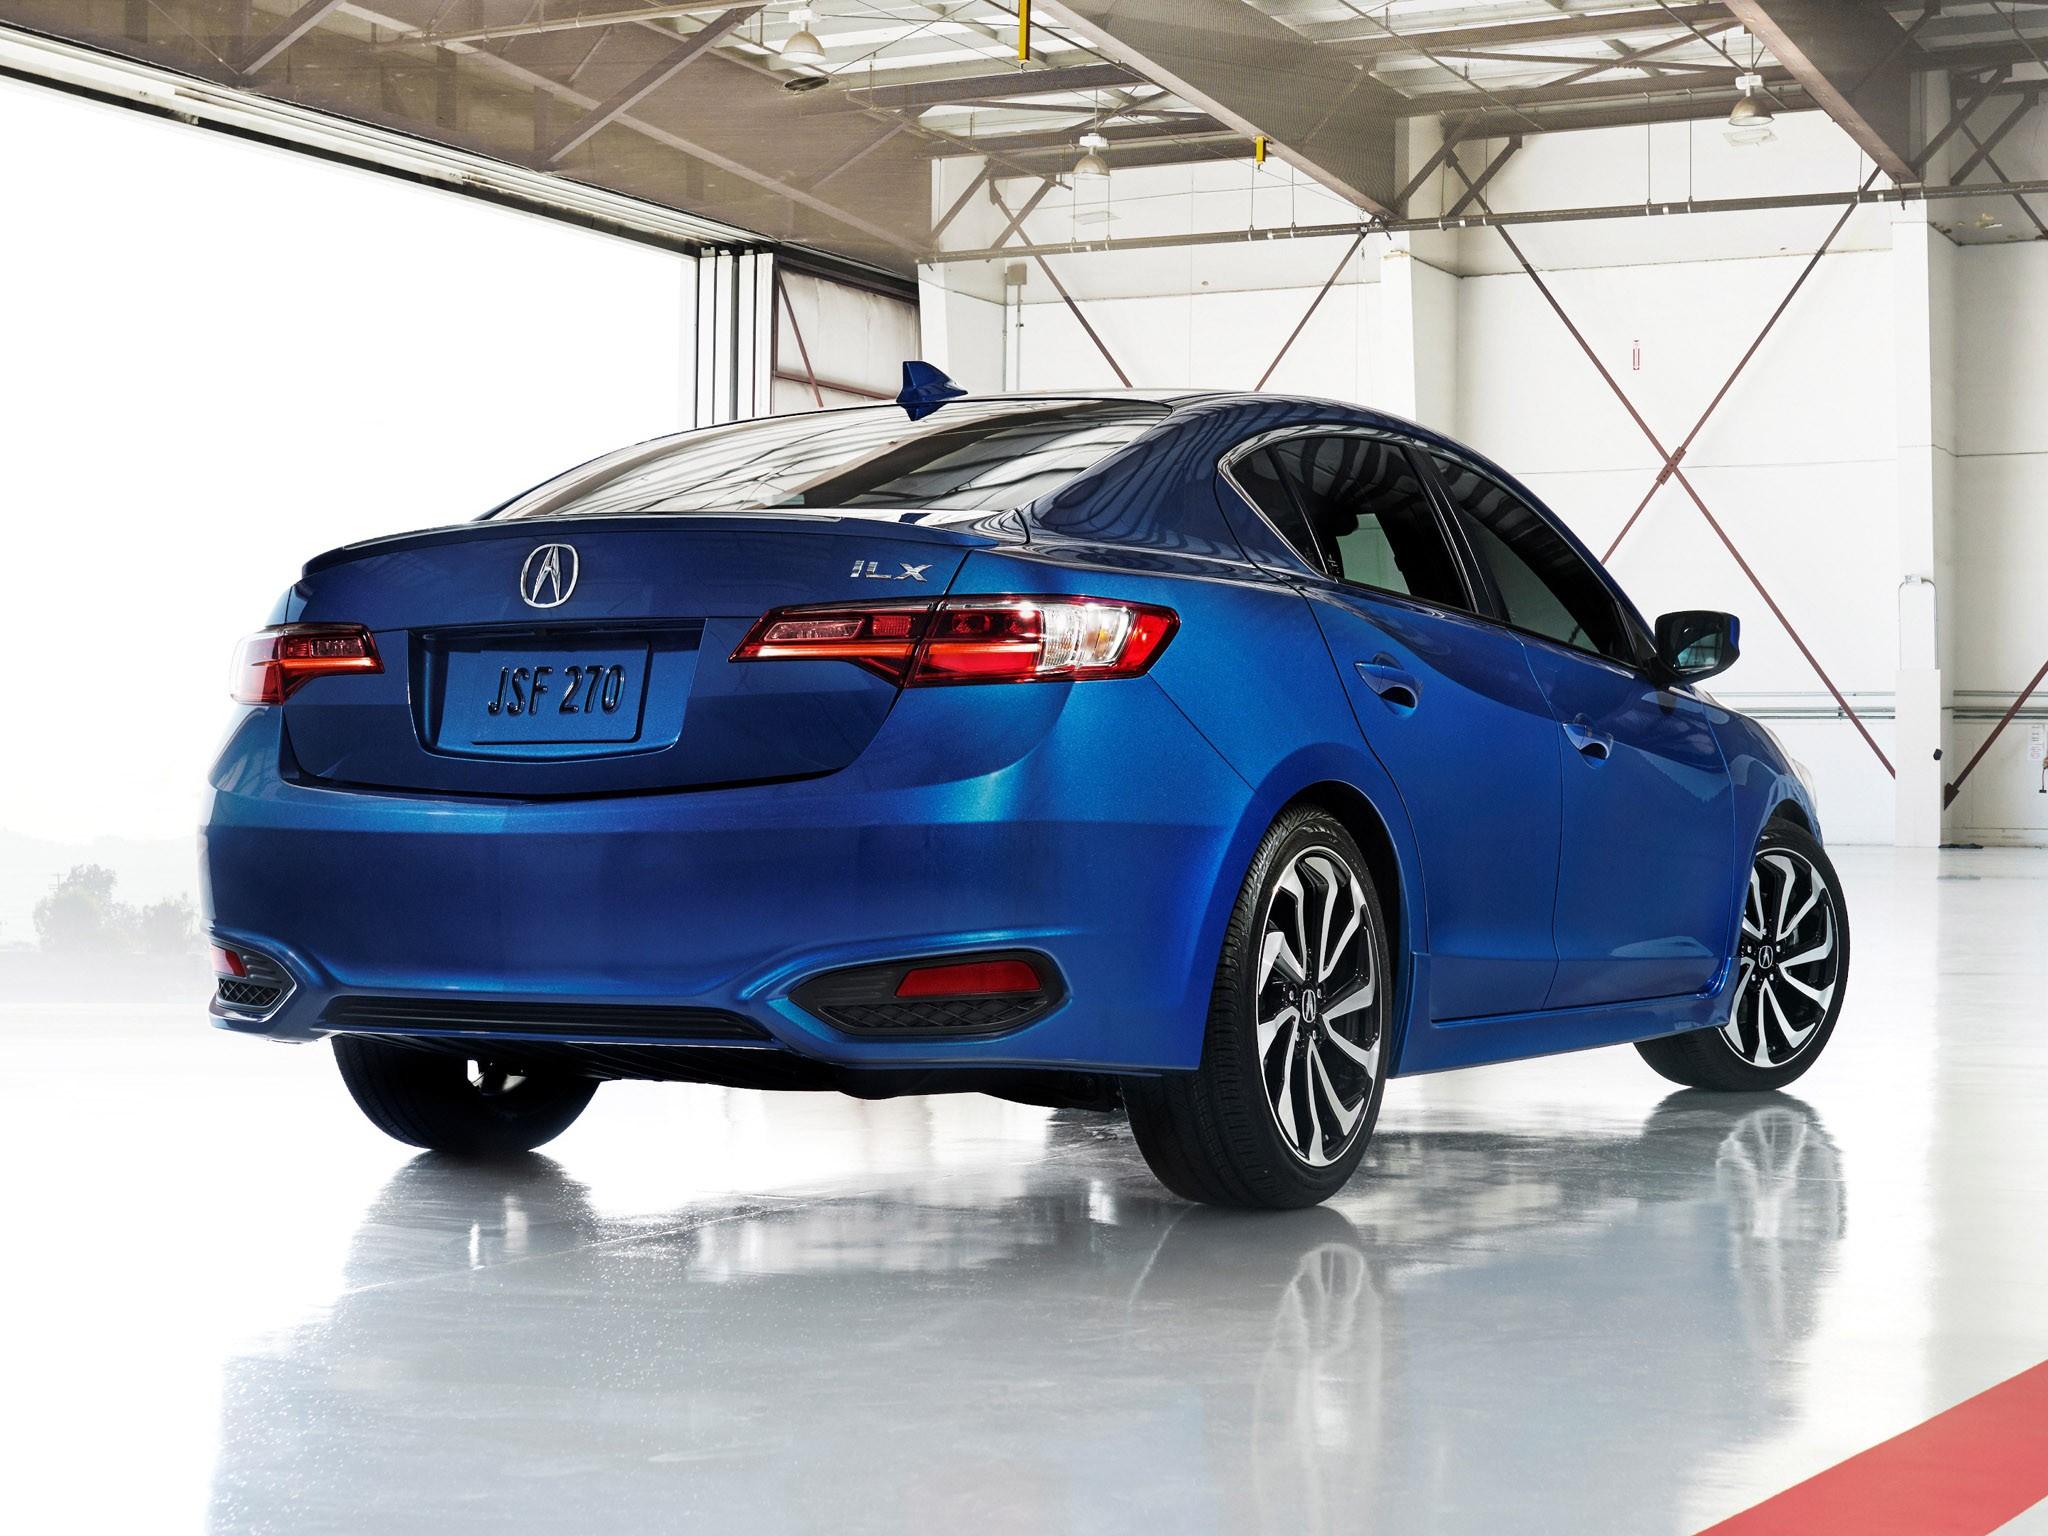 2015 Acura ILX 2.4